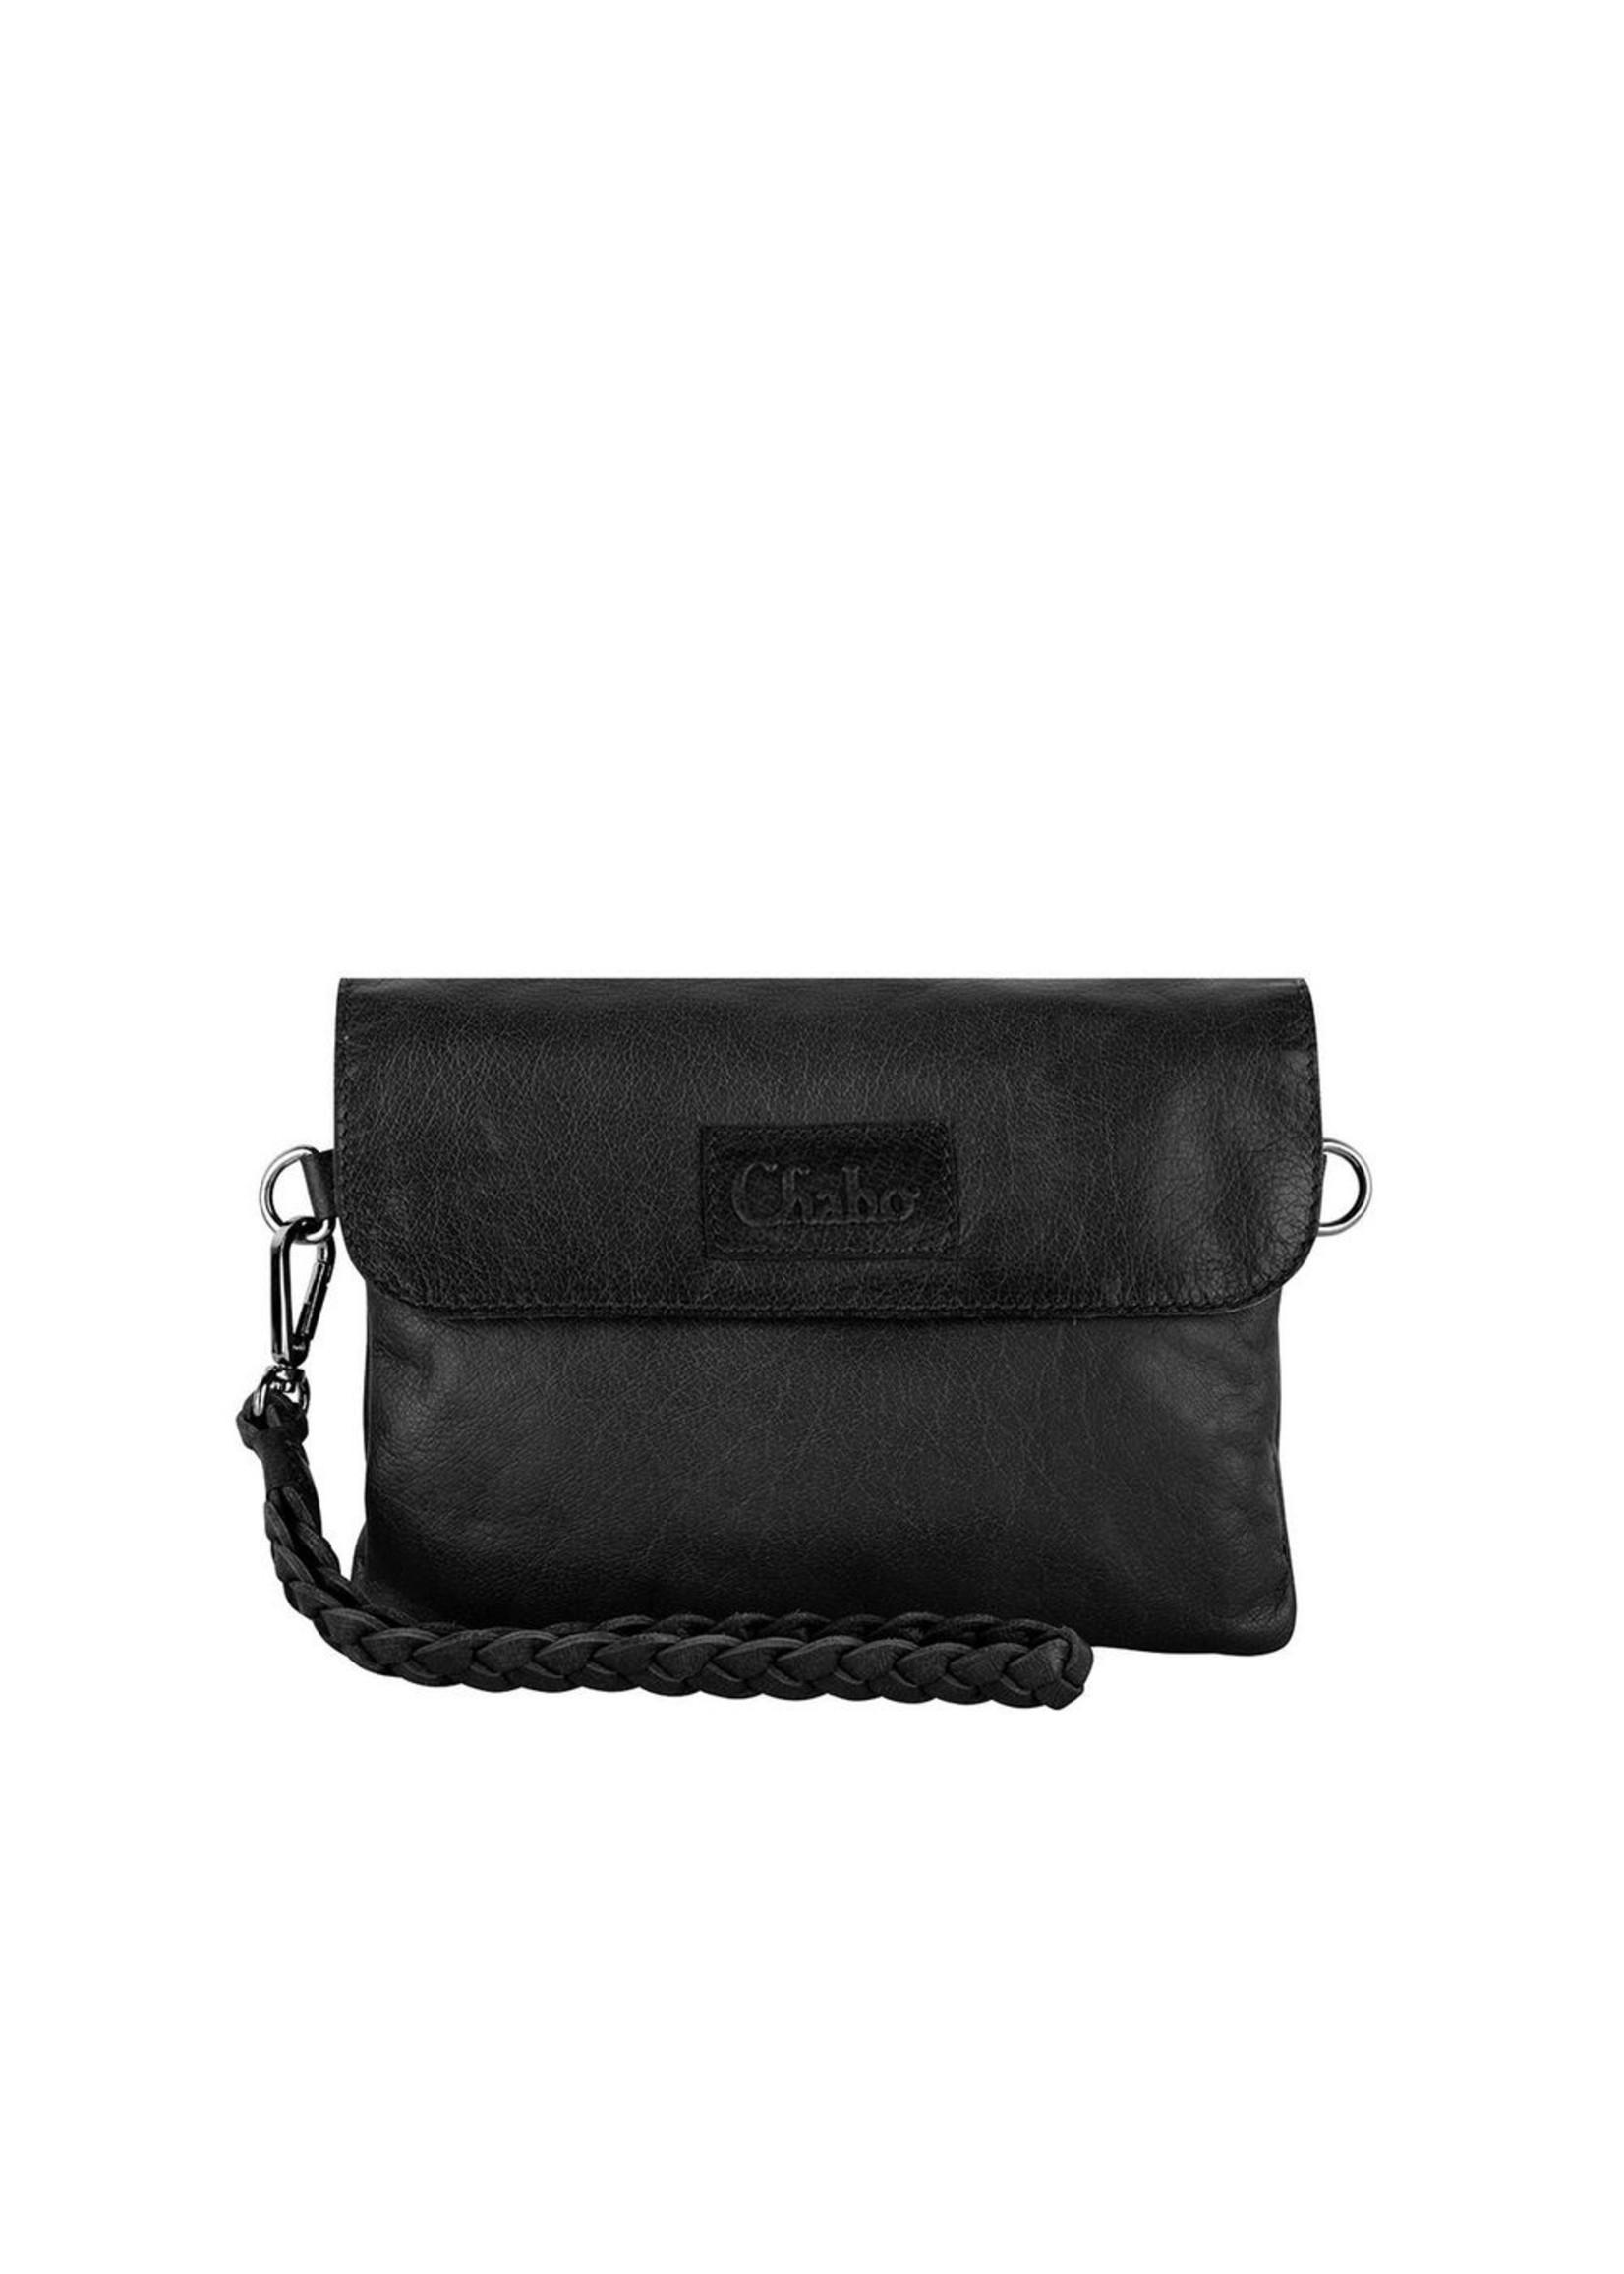 Chabo Bags Bink Style Crossover tas Zwart